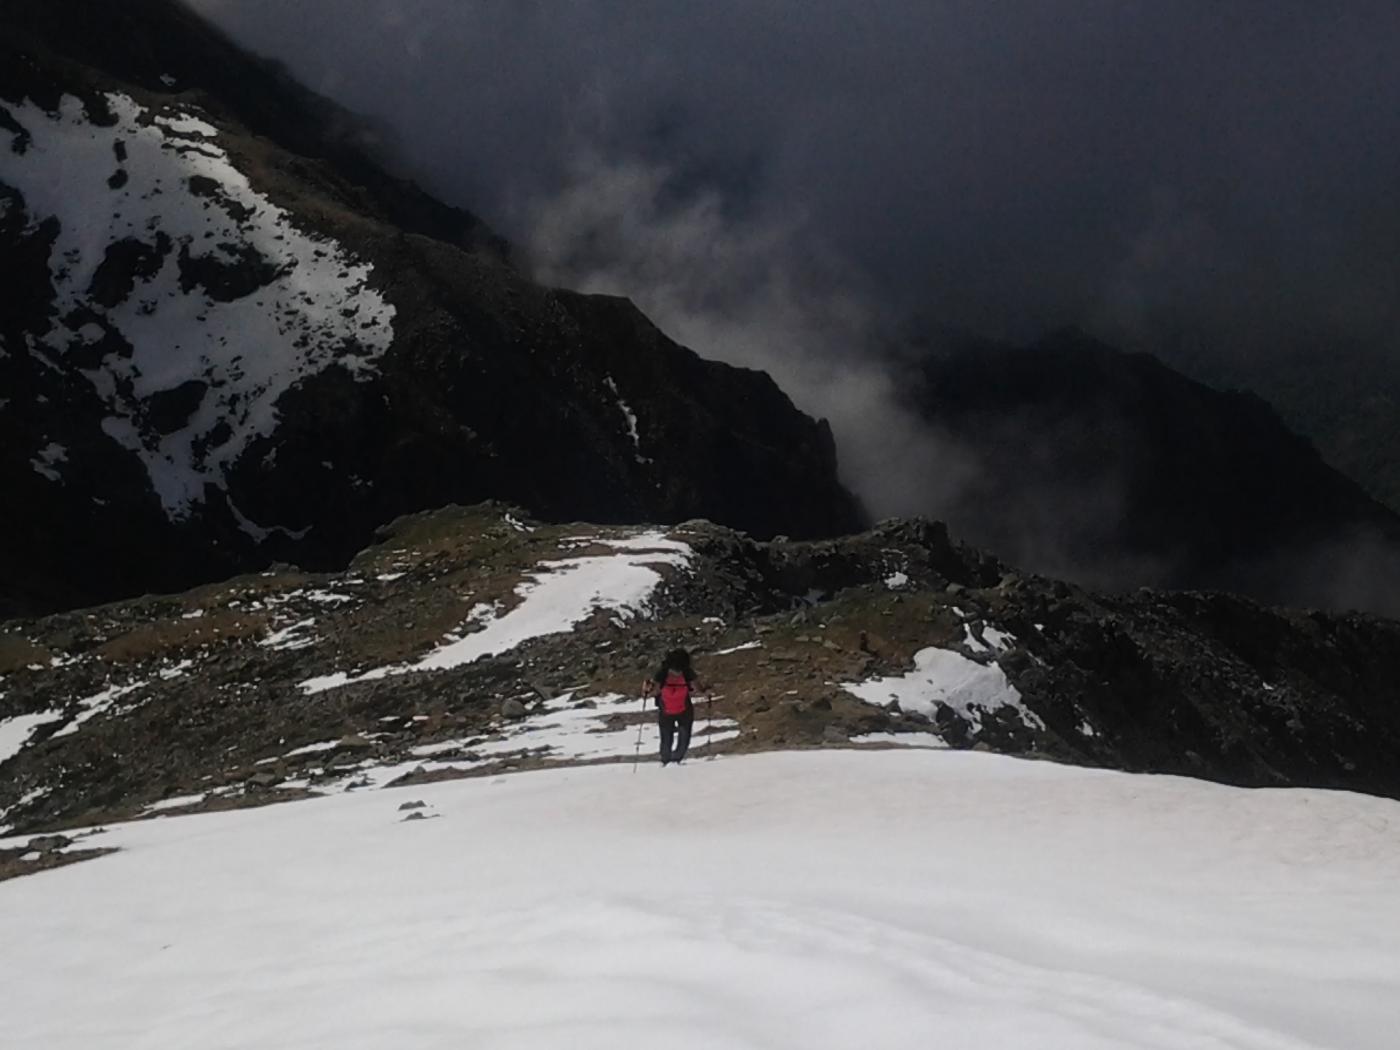 Bruna sul nevaietto